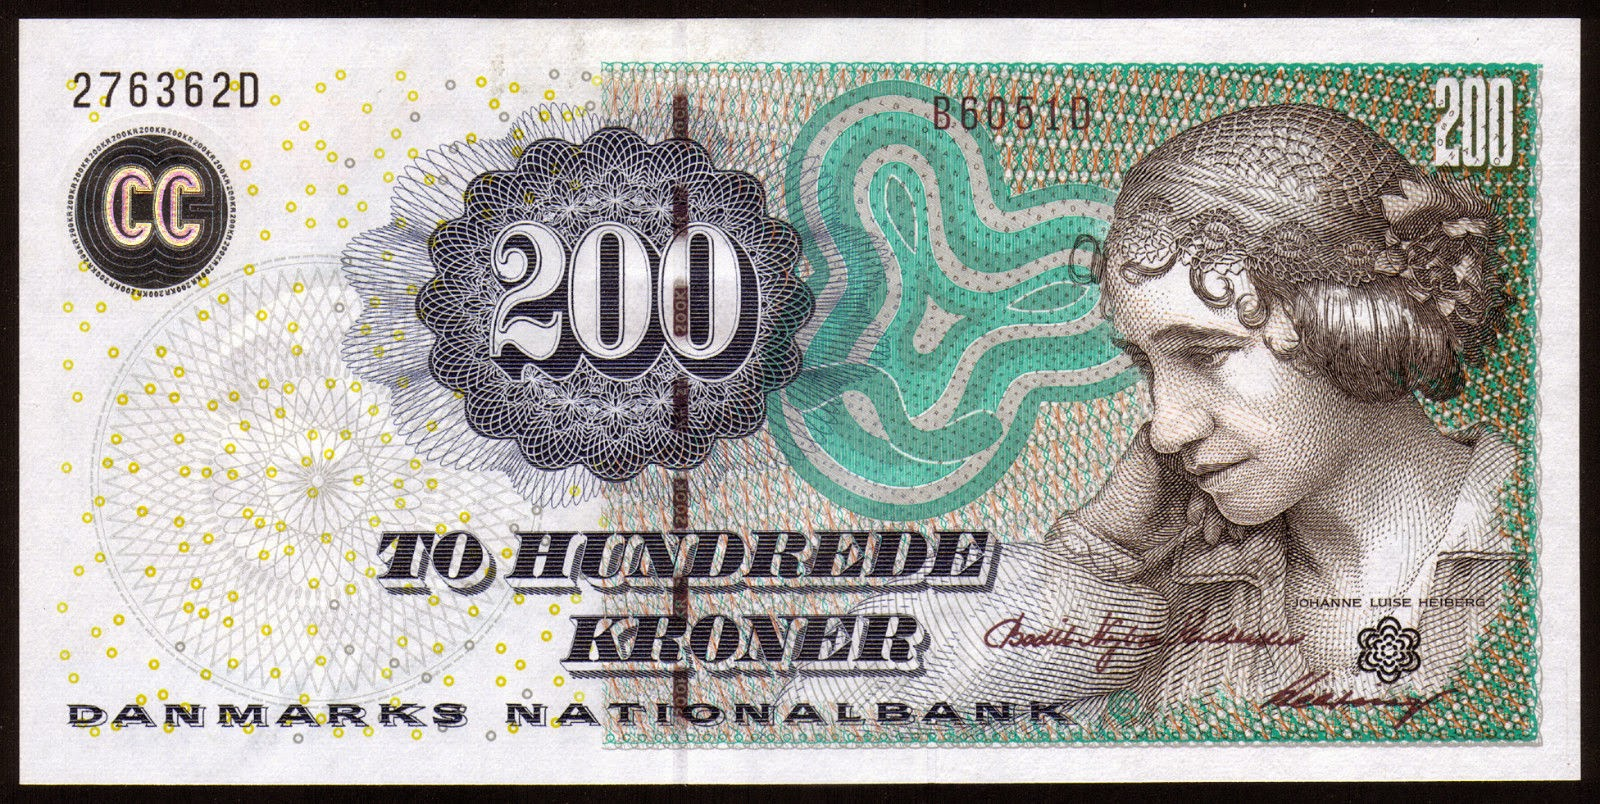 Banknotes of Denmark 200 krone banknote 2005 Johanne Luise Heiberg